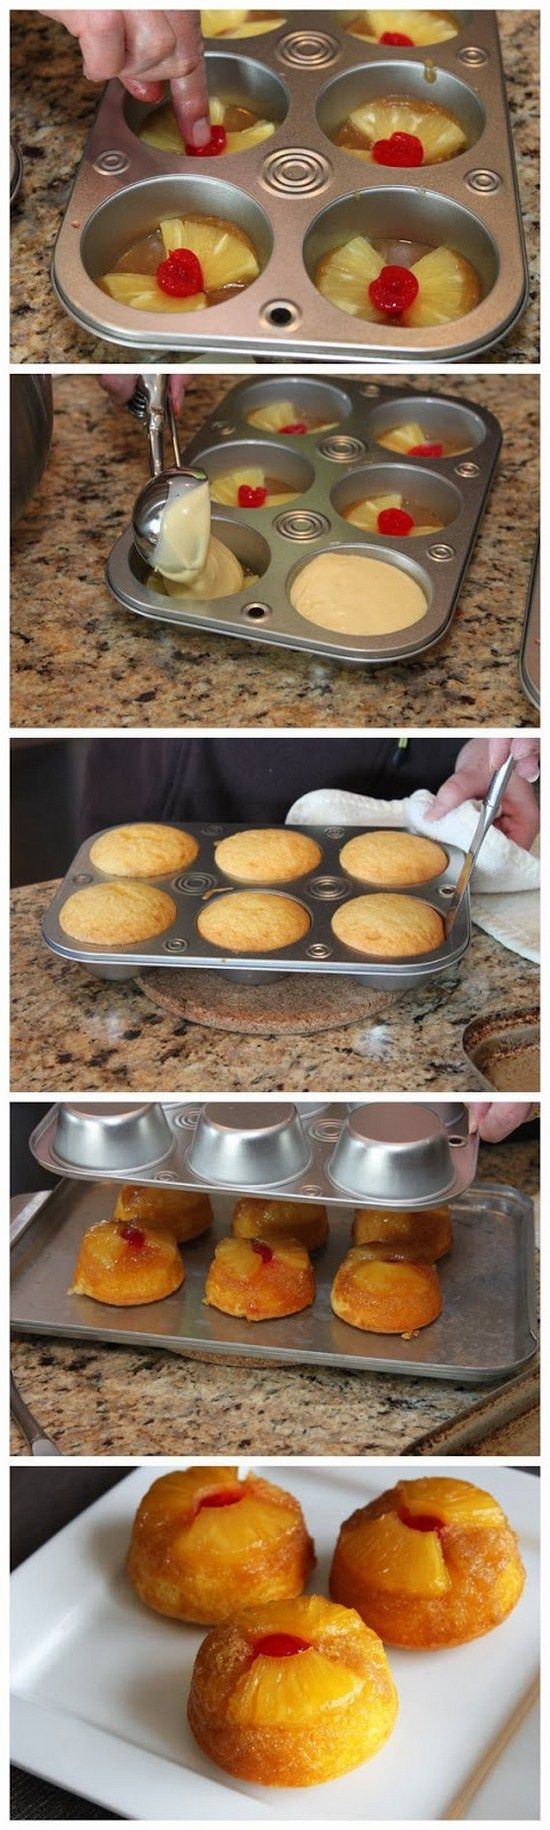 Pineapple Upside-Down Mini-Cakes